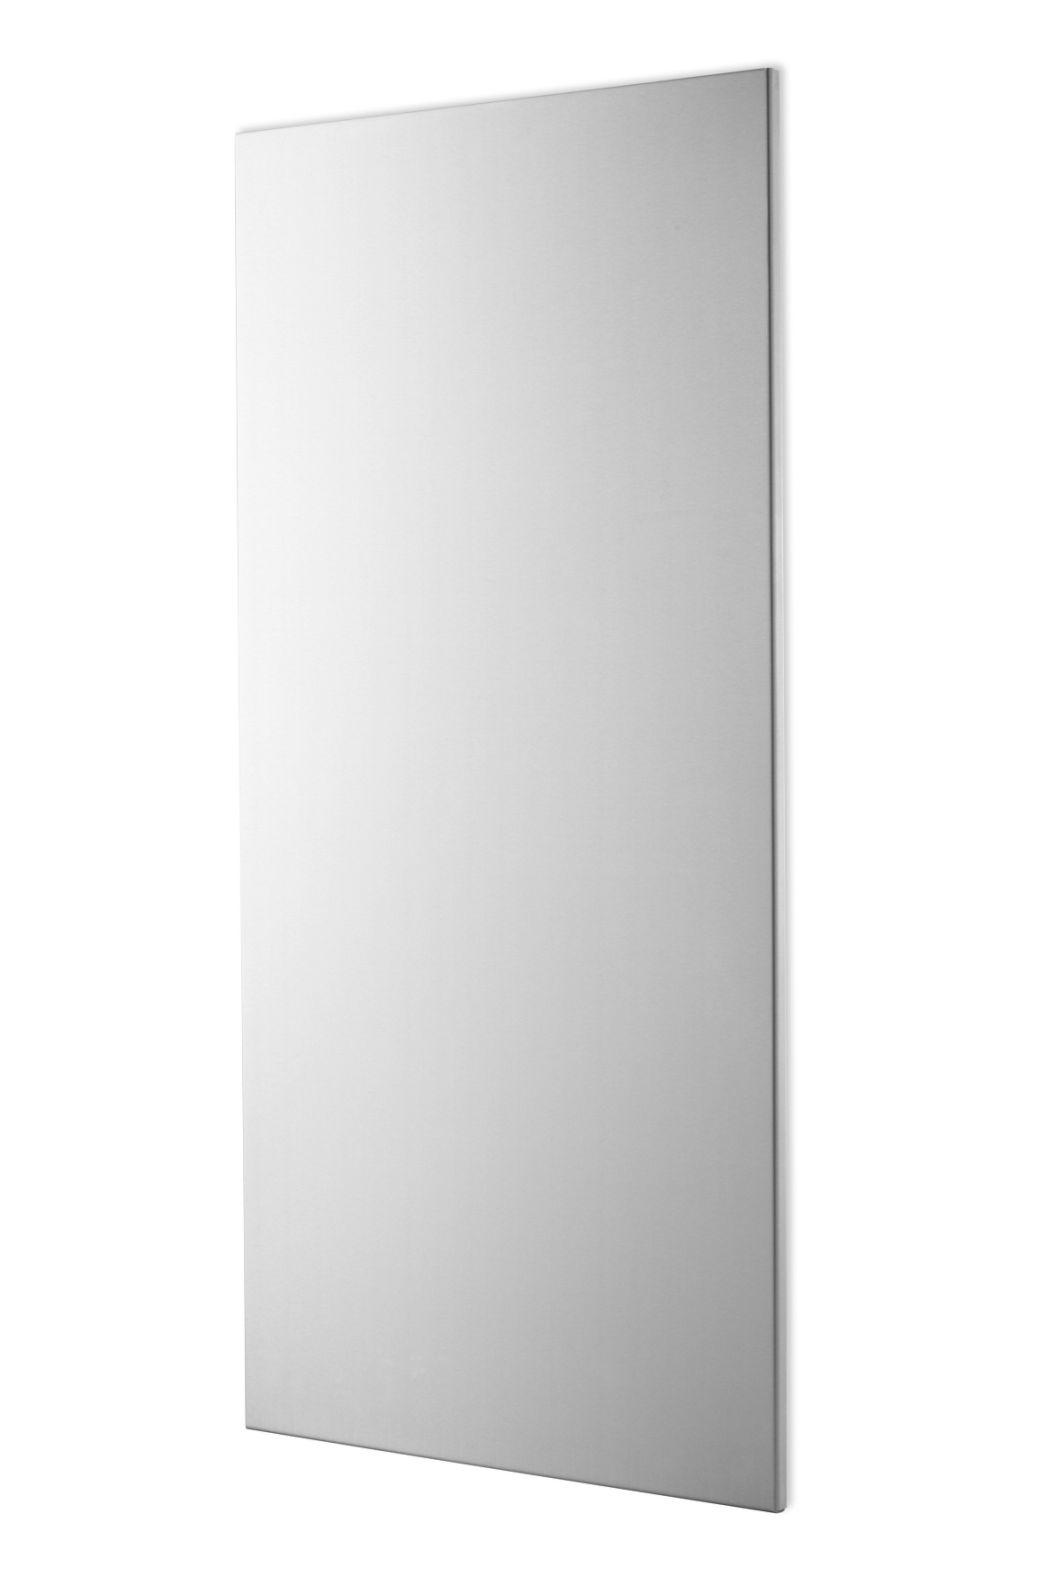 Magnetická tabule PERCETTO, 75 x 35 cm - ZACK